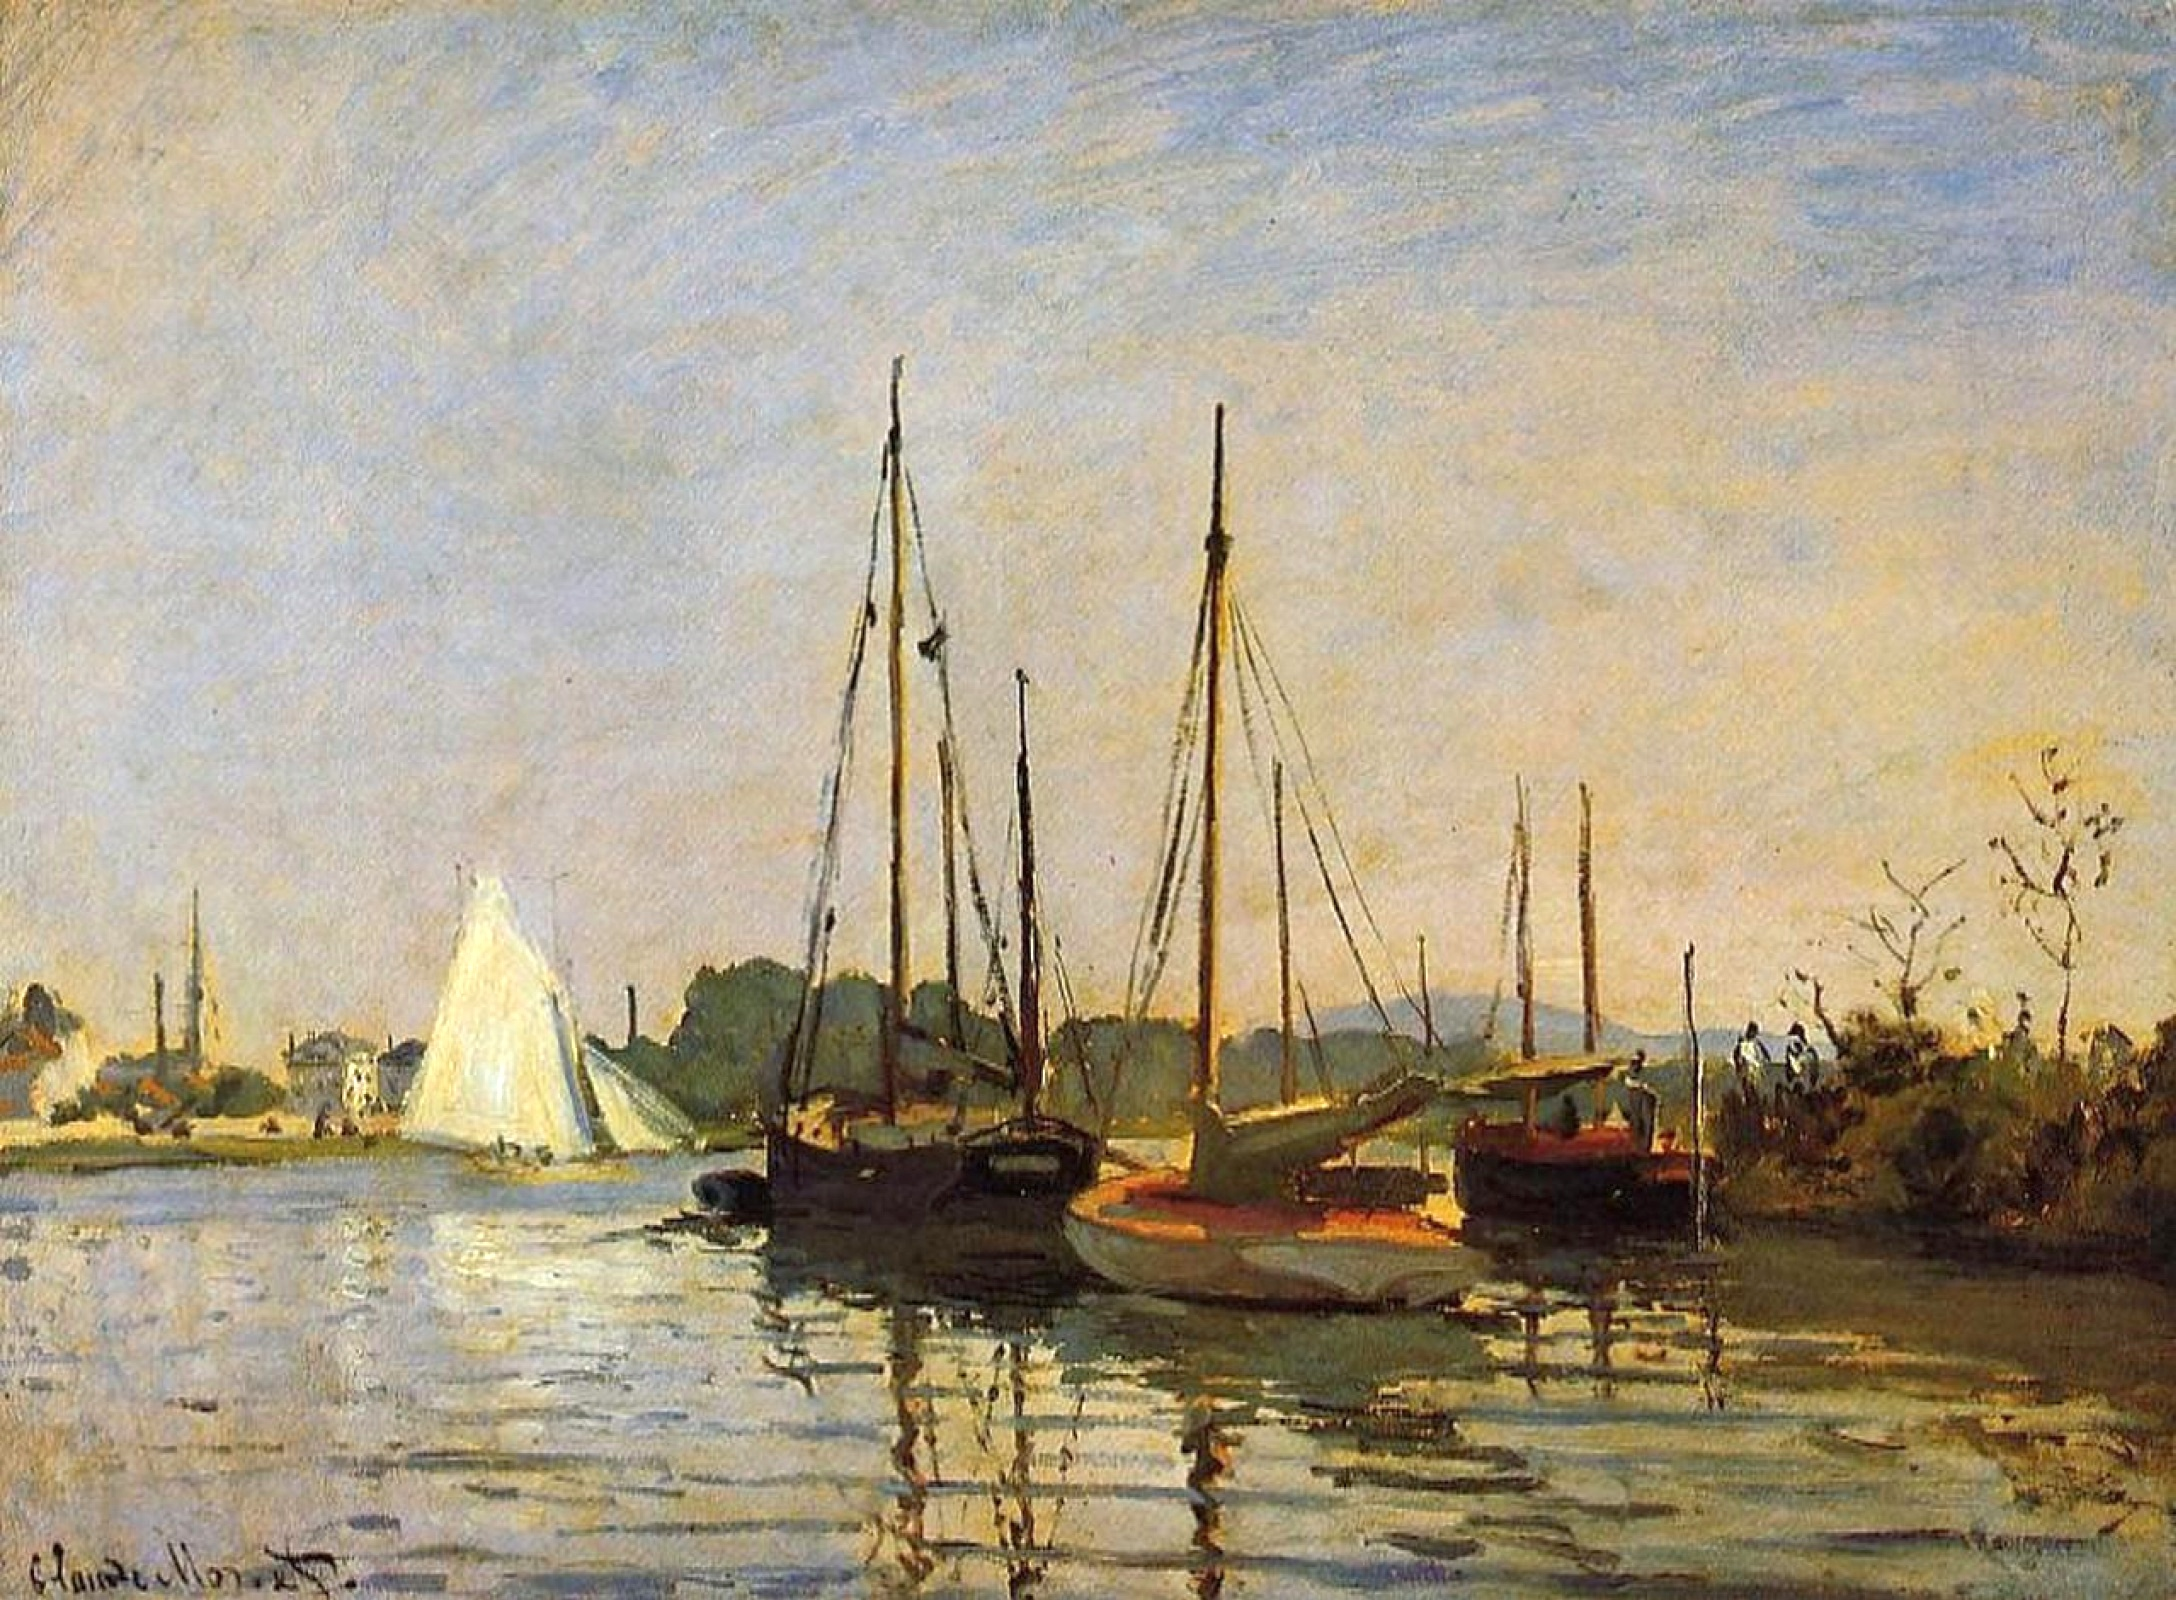 пейзажи - парусники и лодки < Прогулочные лодки >:: Клод Моне, описание картины - Claude Monet фото